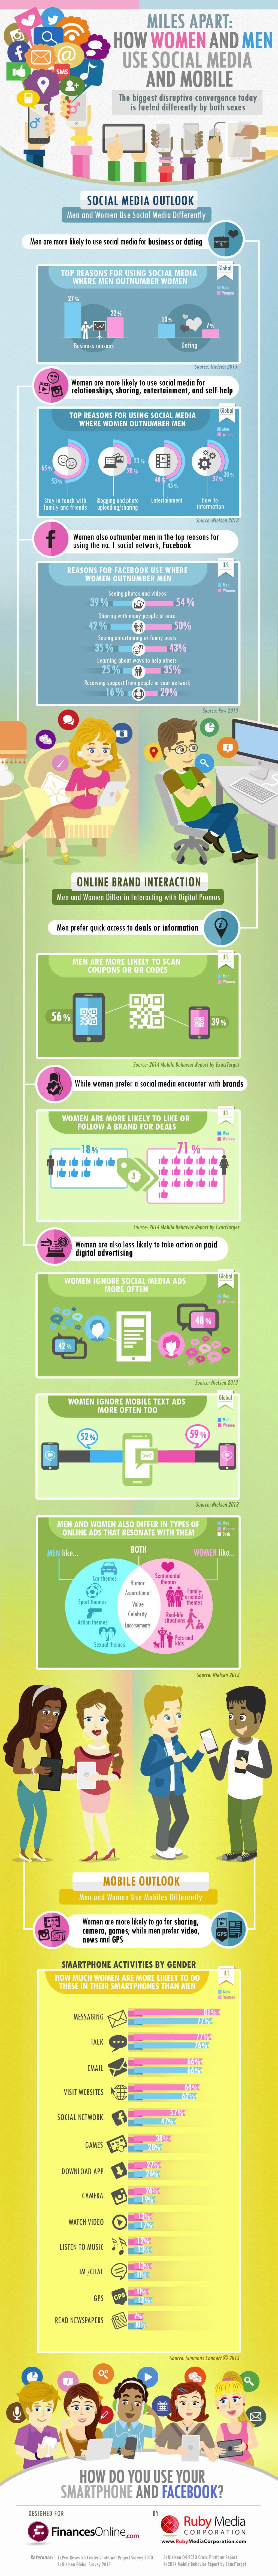 smartphone-social-media-usage-men-vs-women-infographic